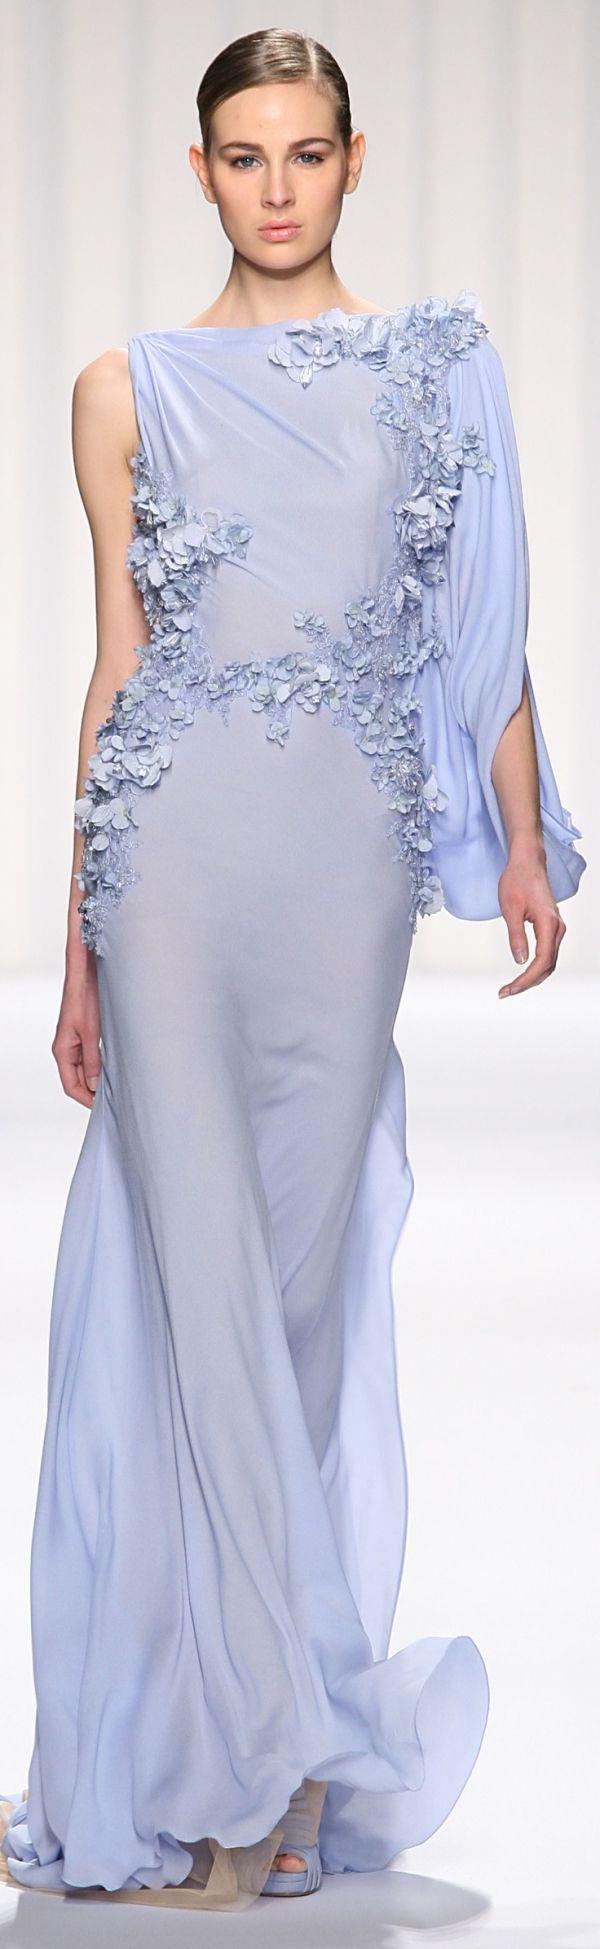 Abed Mahfouz haute couture 2013